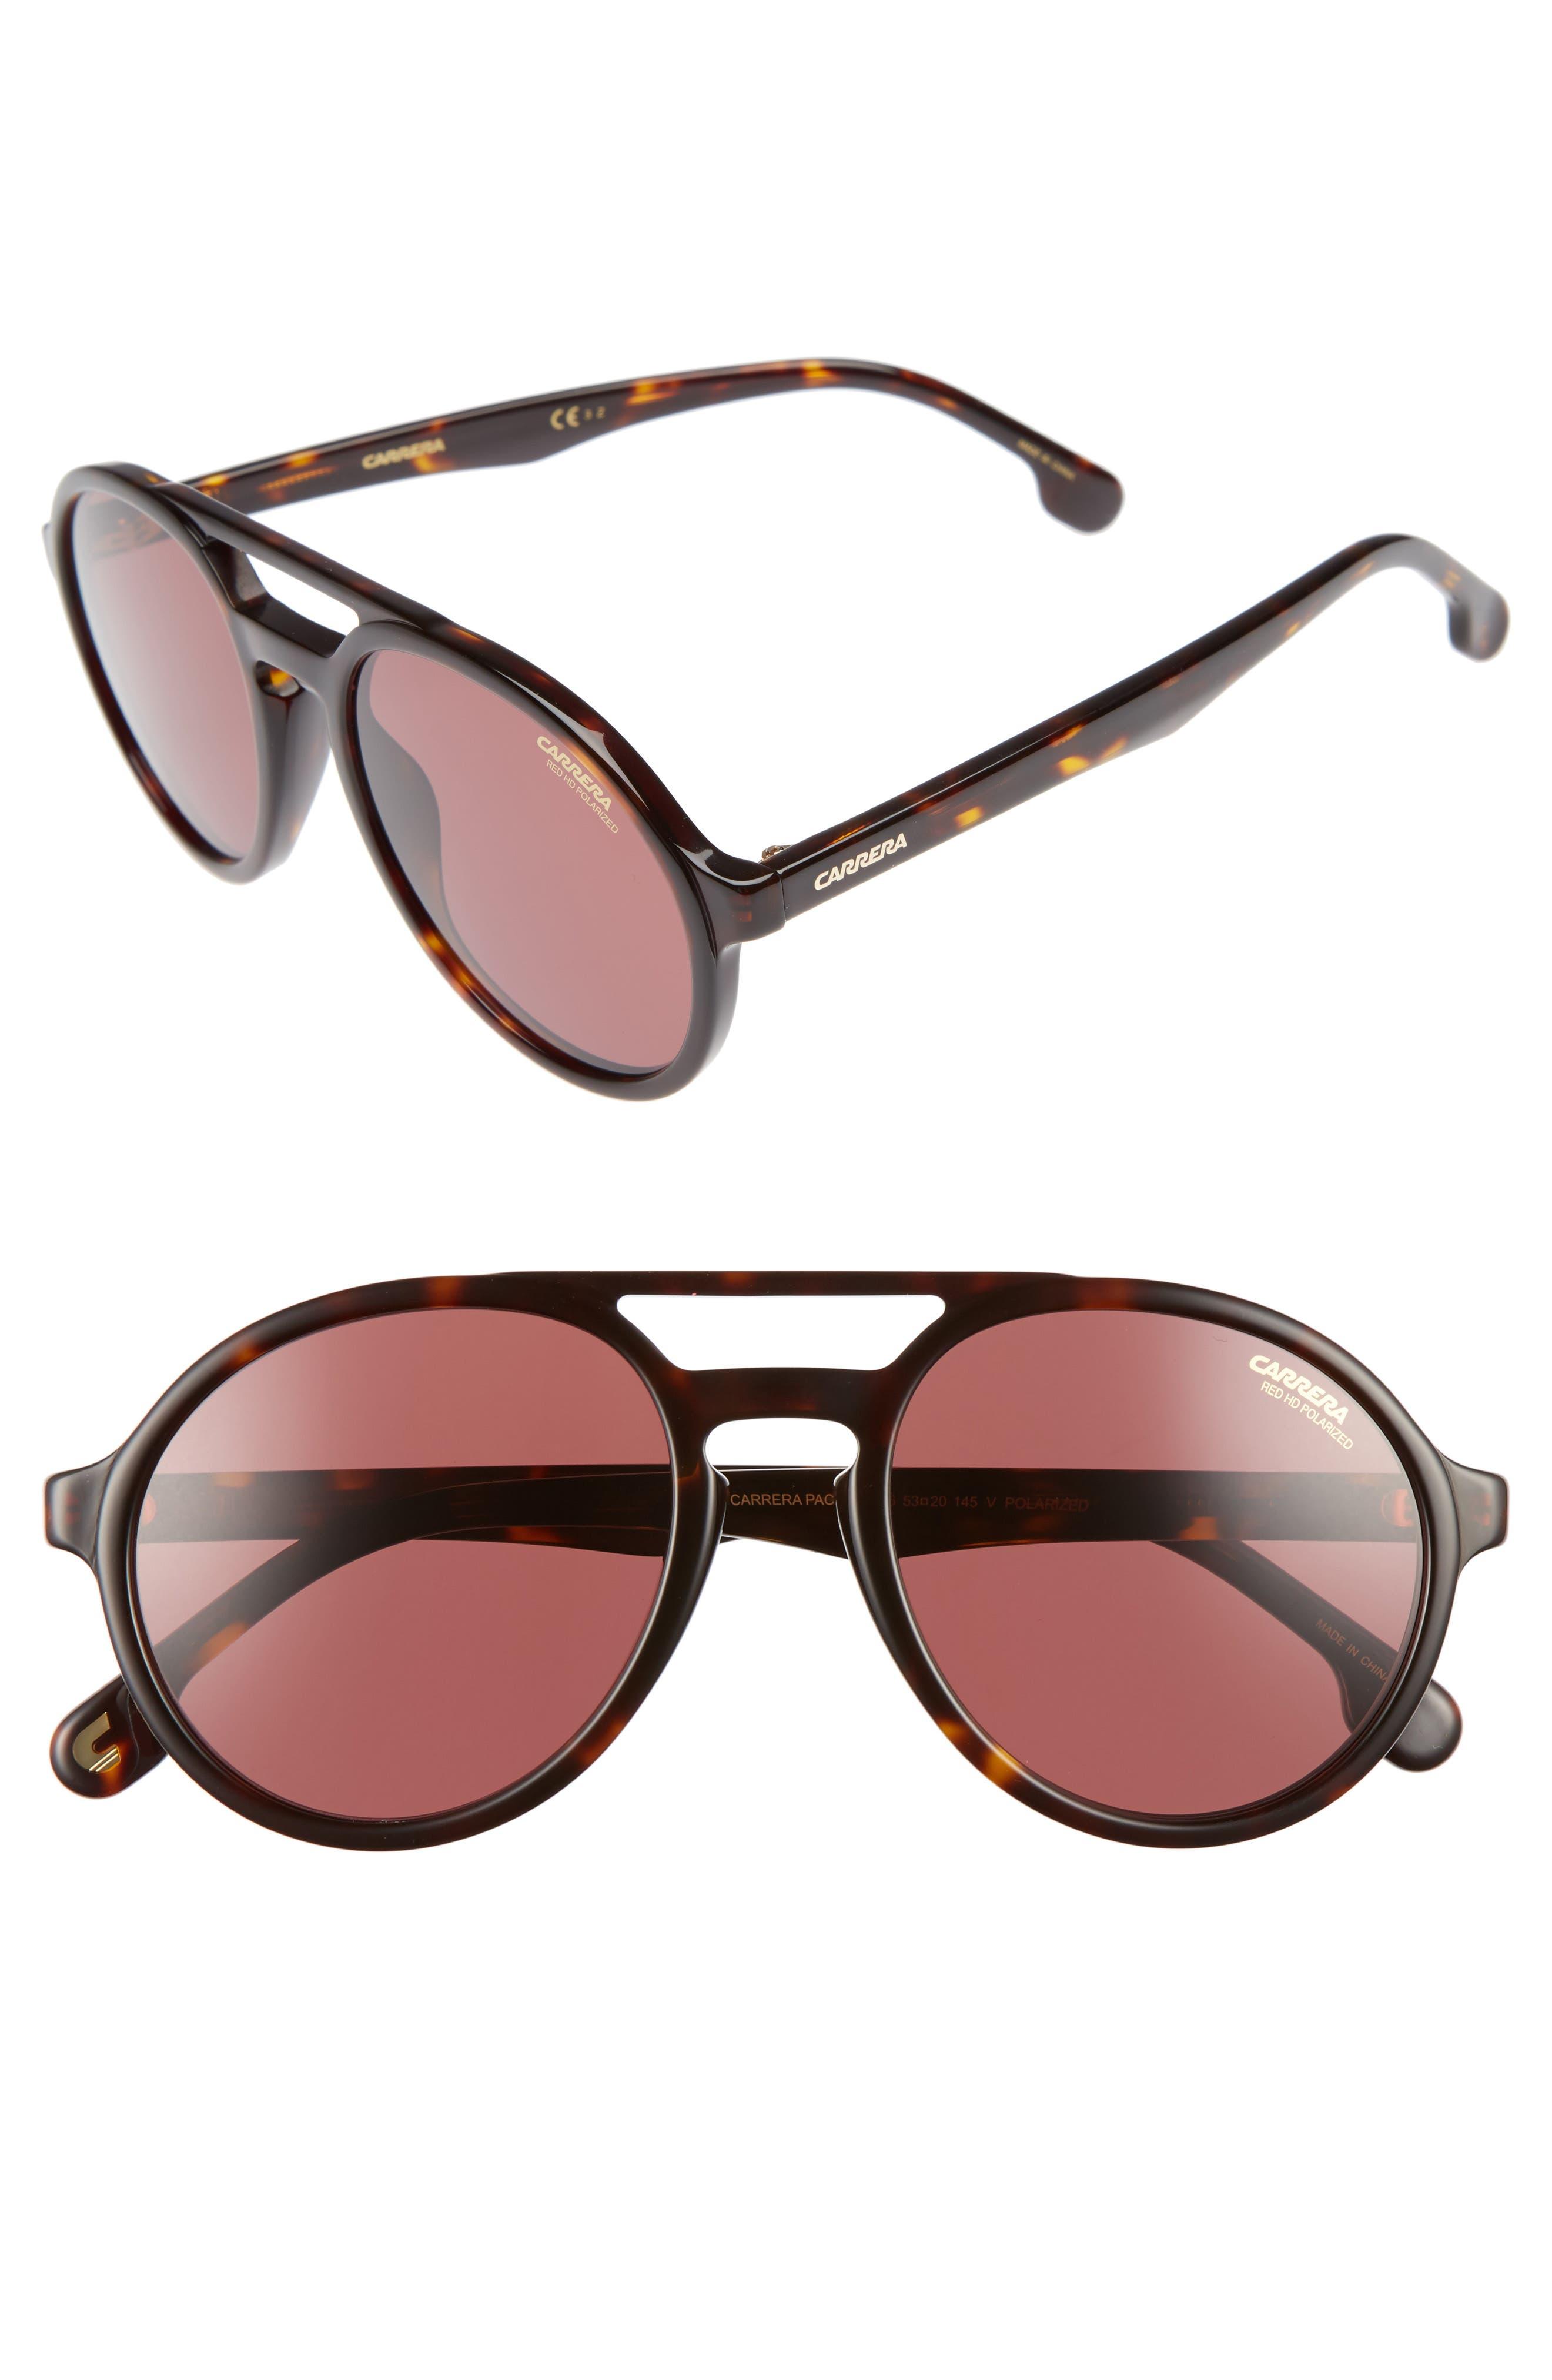 Carrera Pace 53mm Polarized Pilot Sunglasses